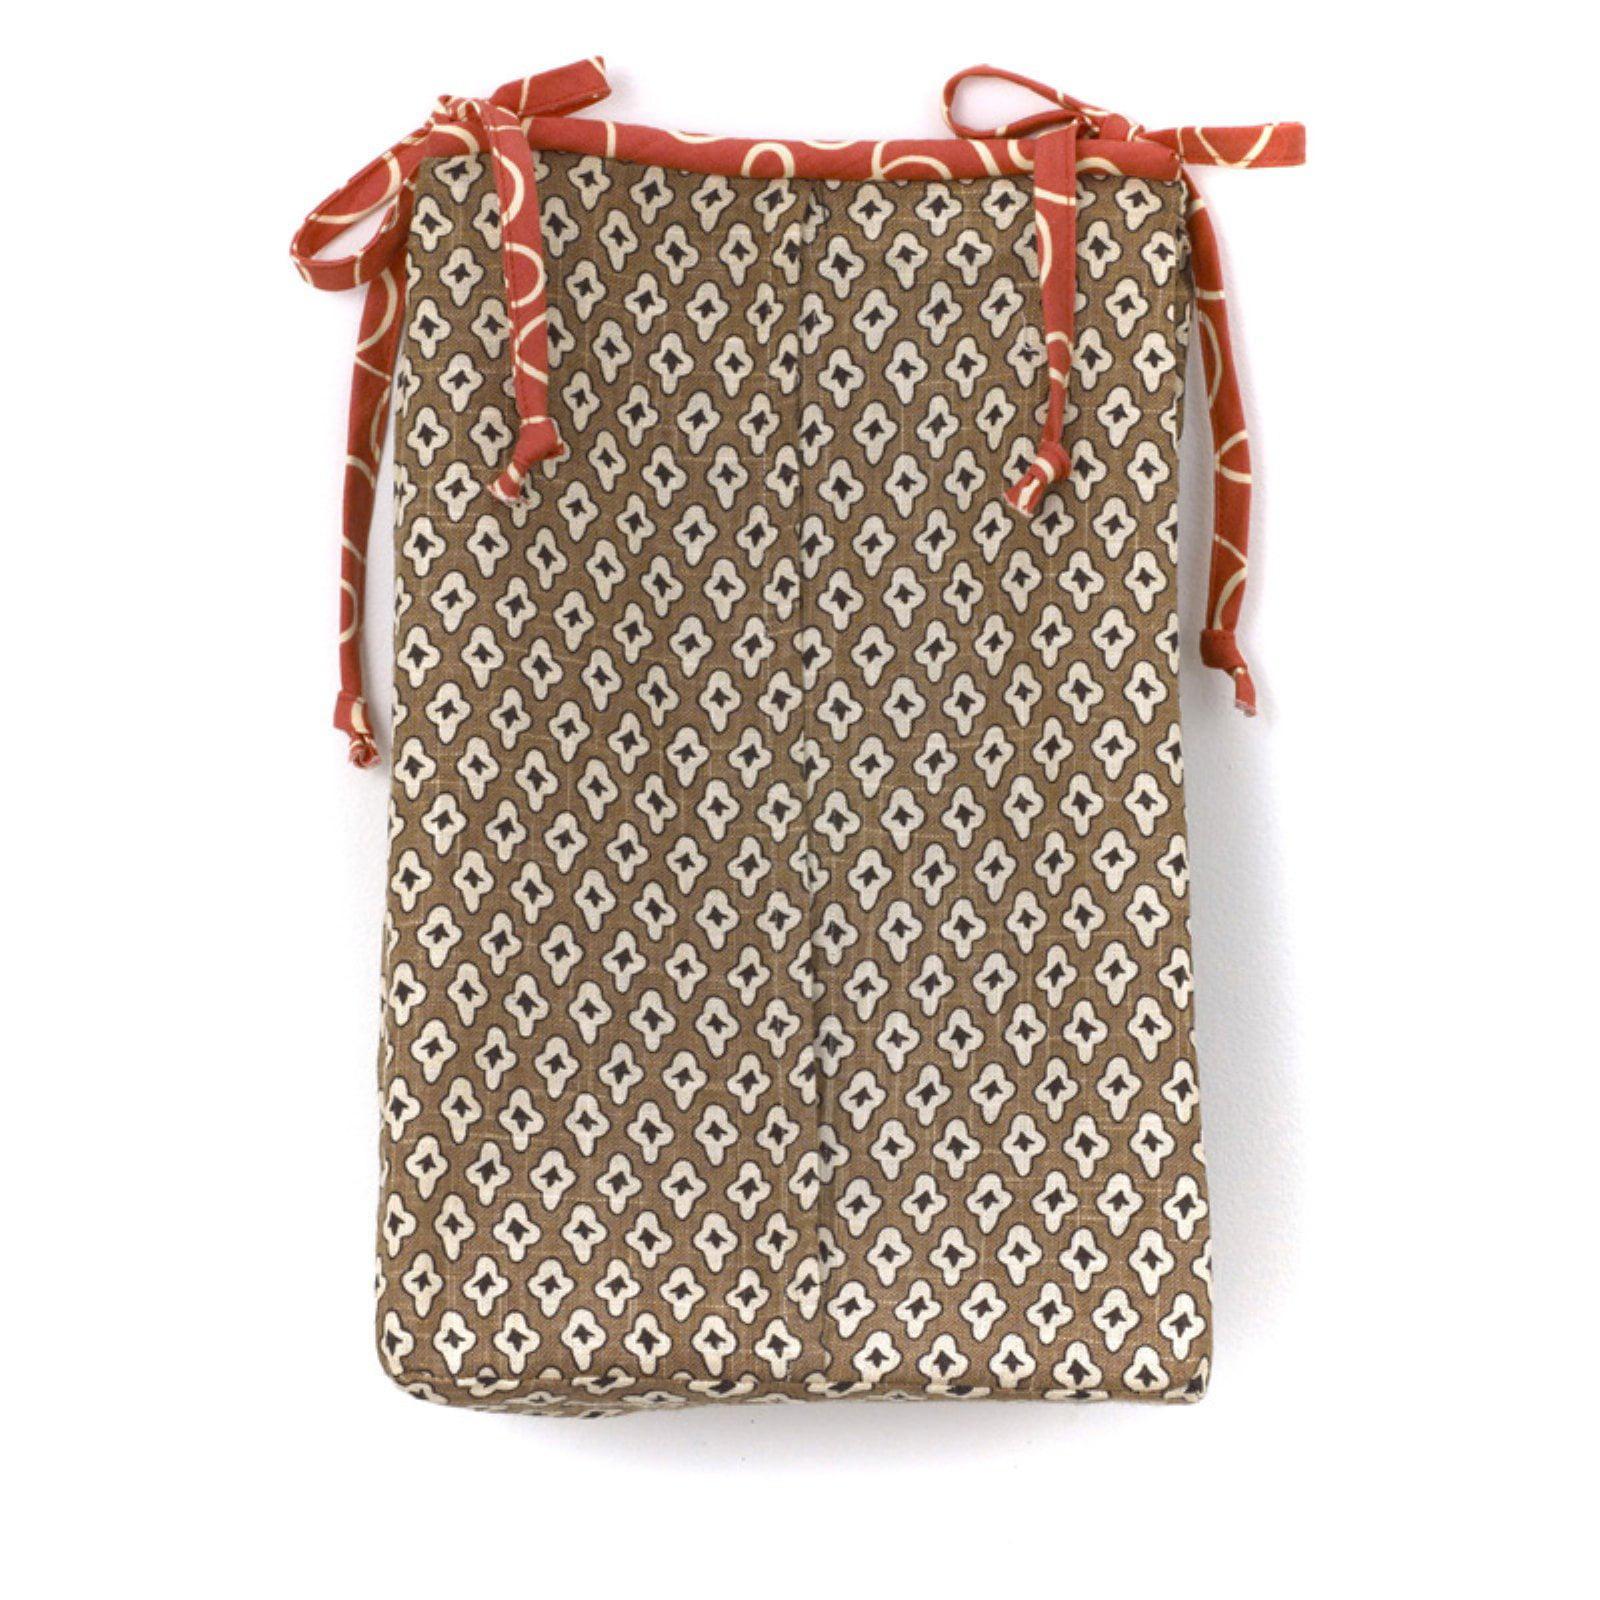 Cotton Tale Designs Peggy Sue Diaper Stacker by Cotton Tale Designs